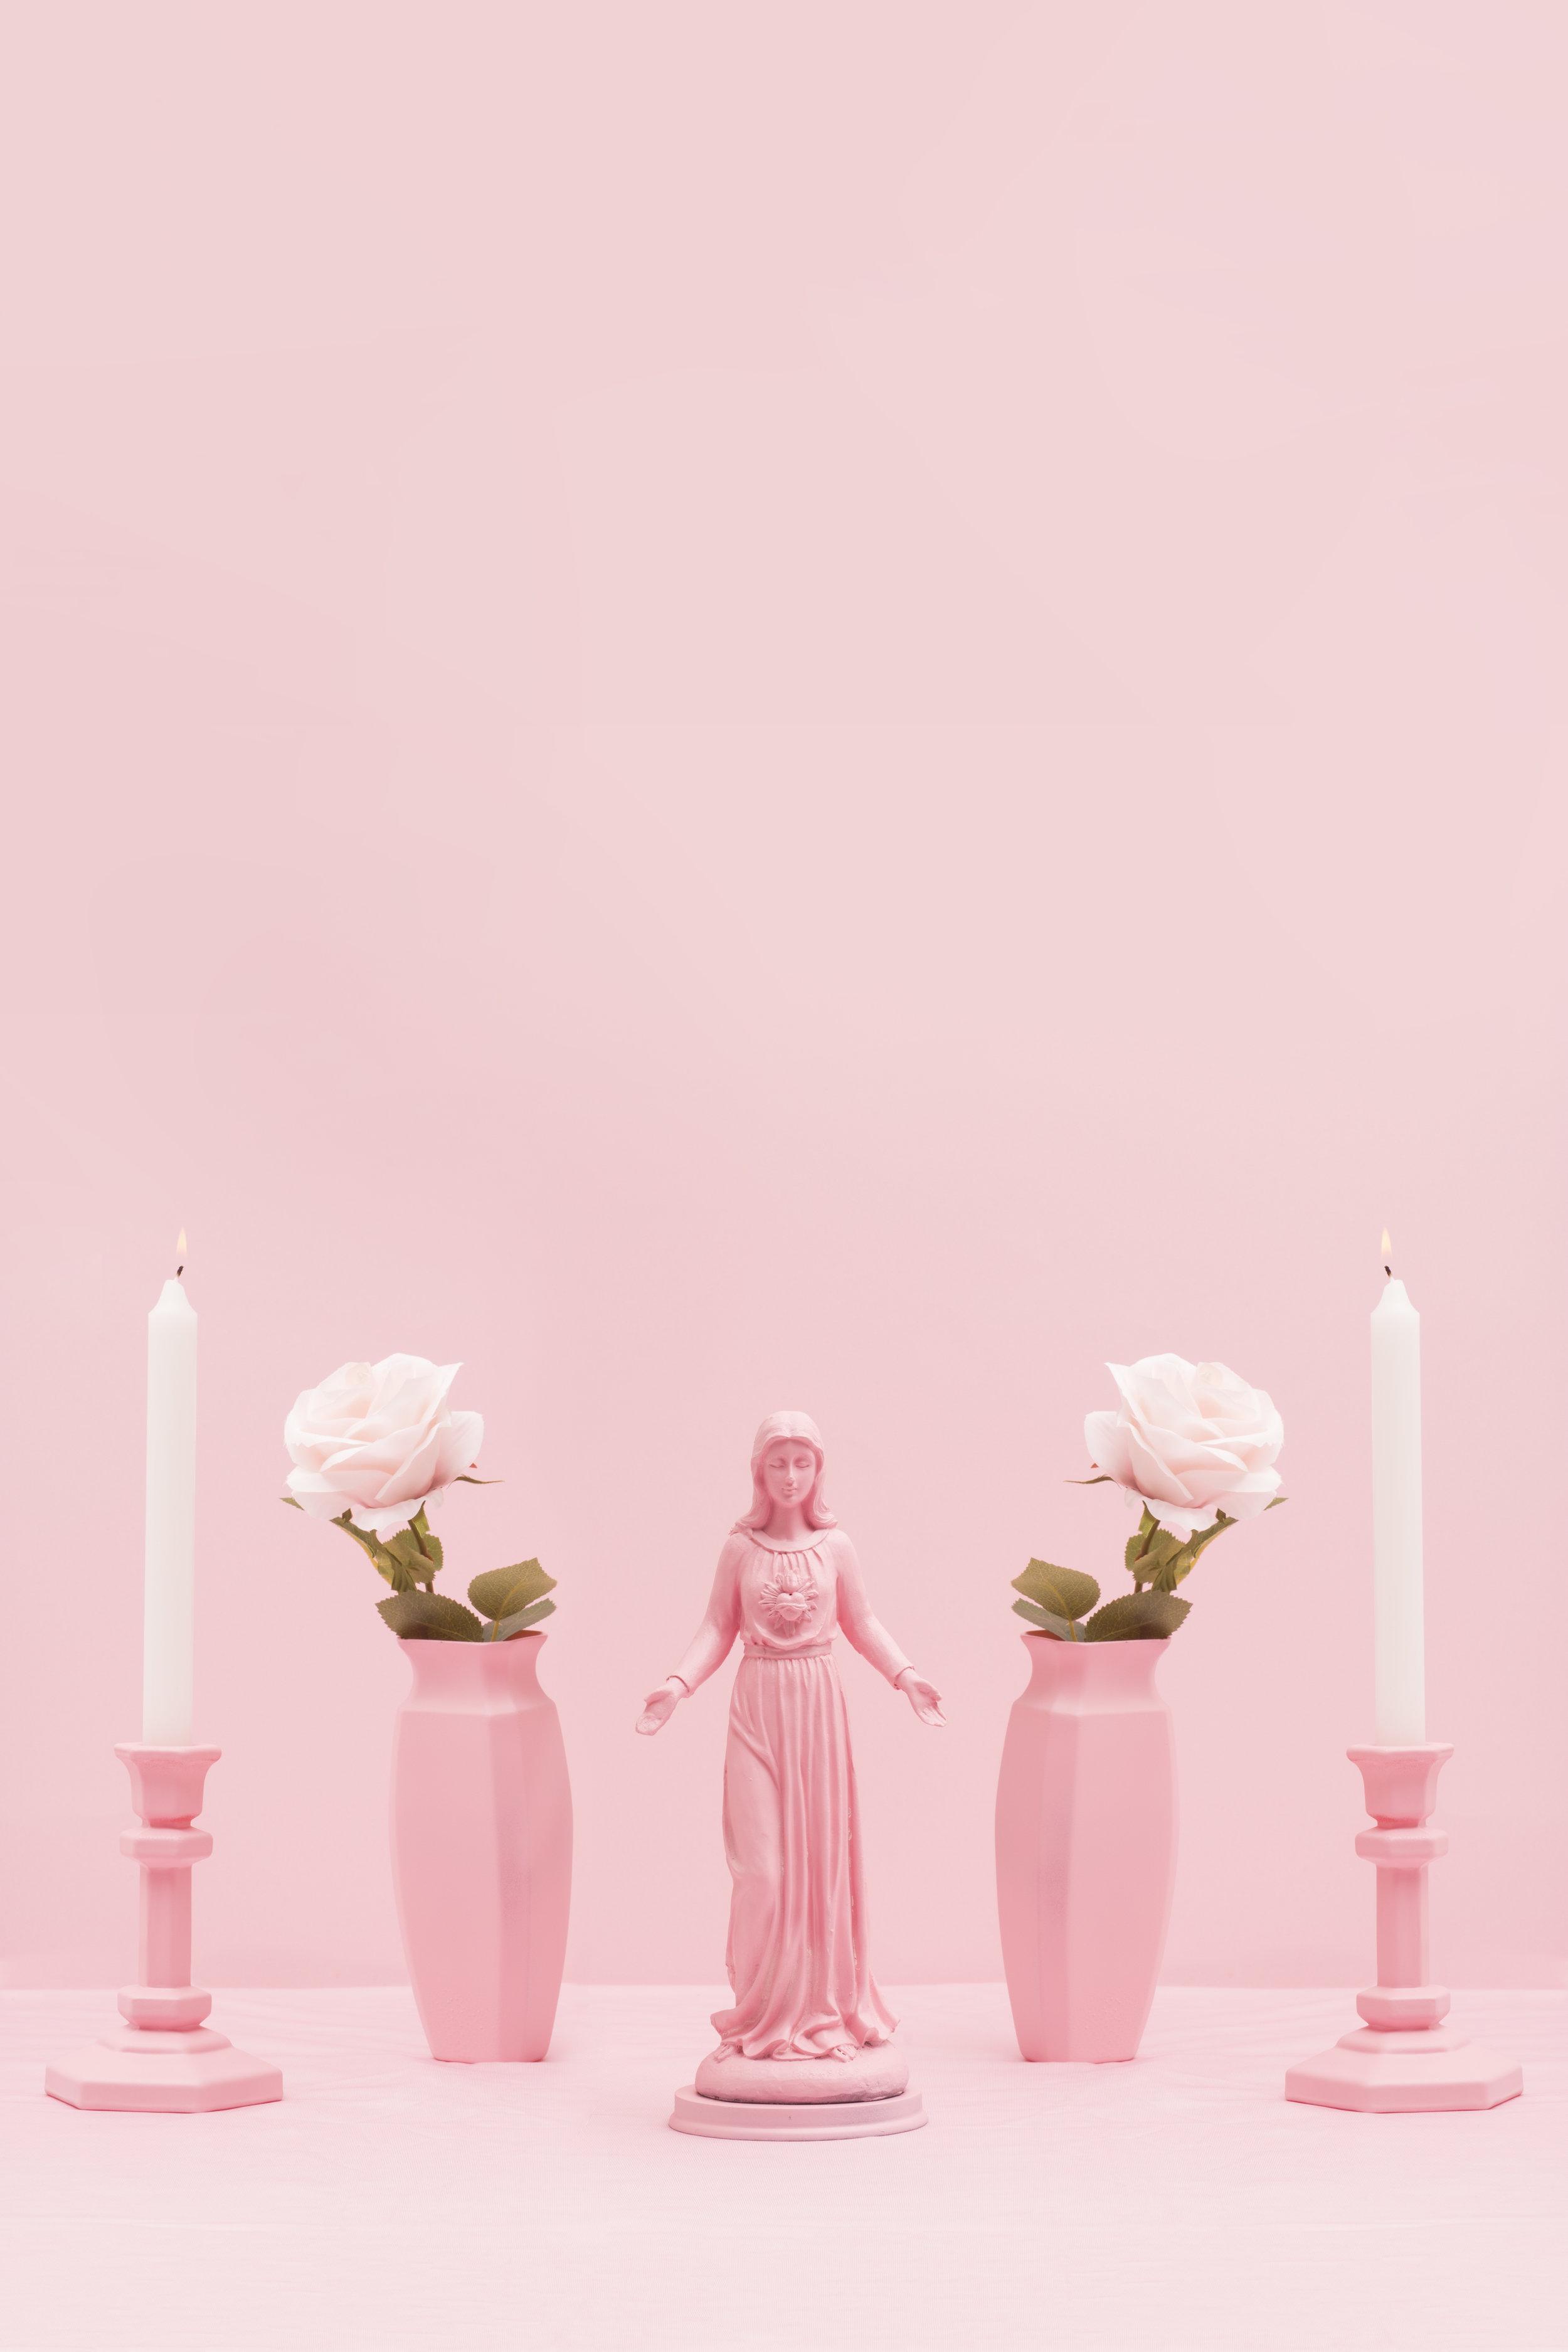 Pink religion_1.jpg